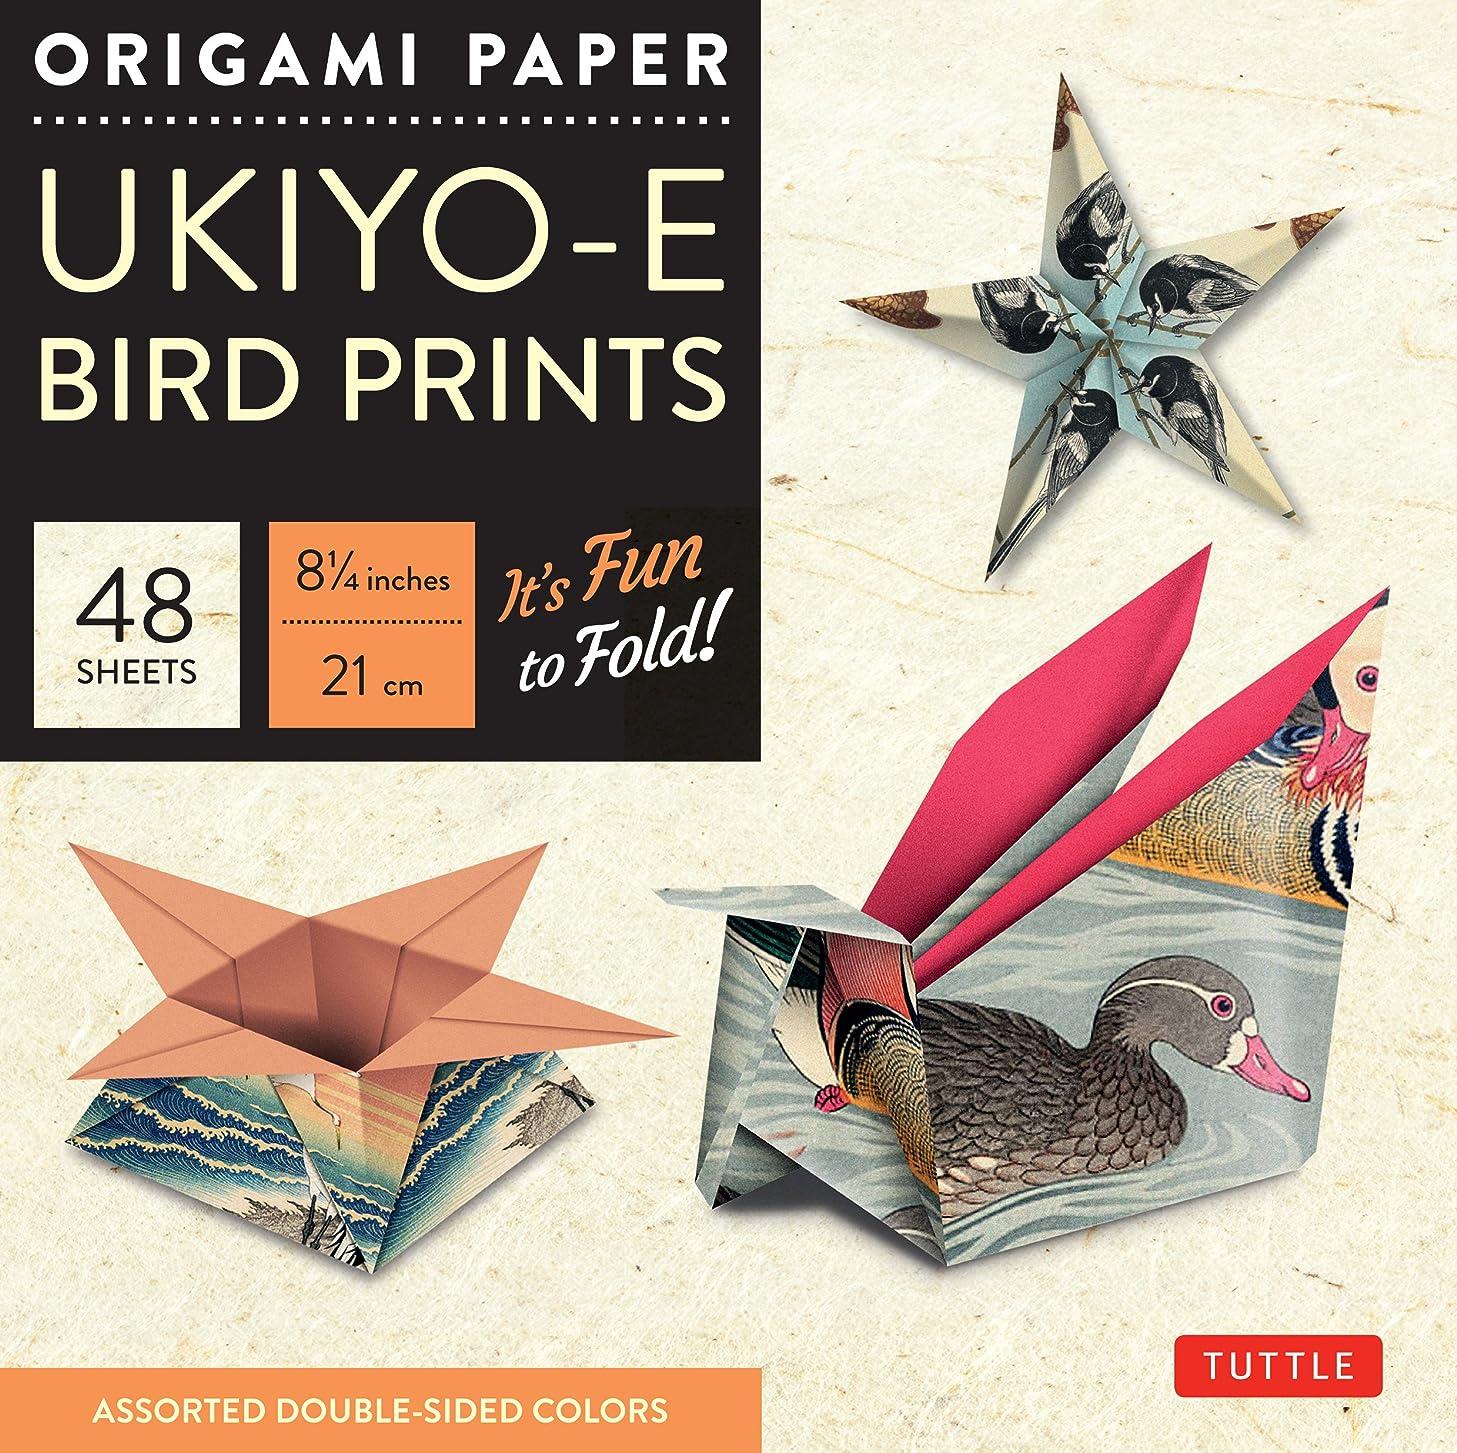 Origami Paper - Ukiyo-e Bird Prints - 8 1/4